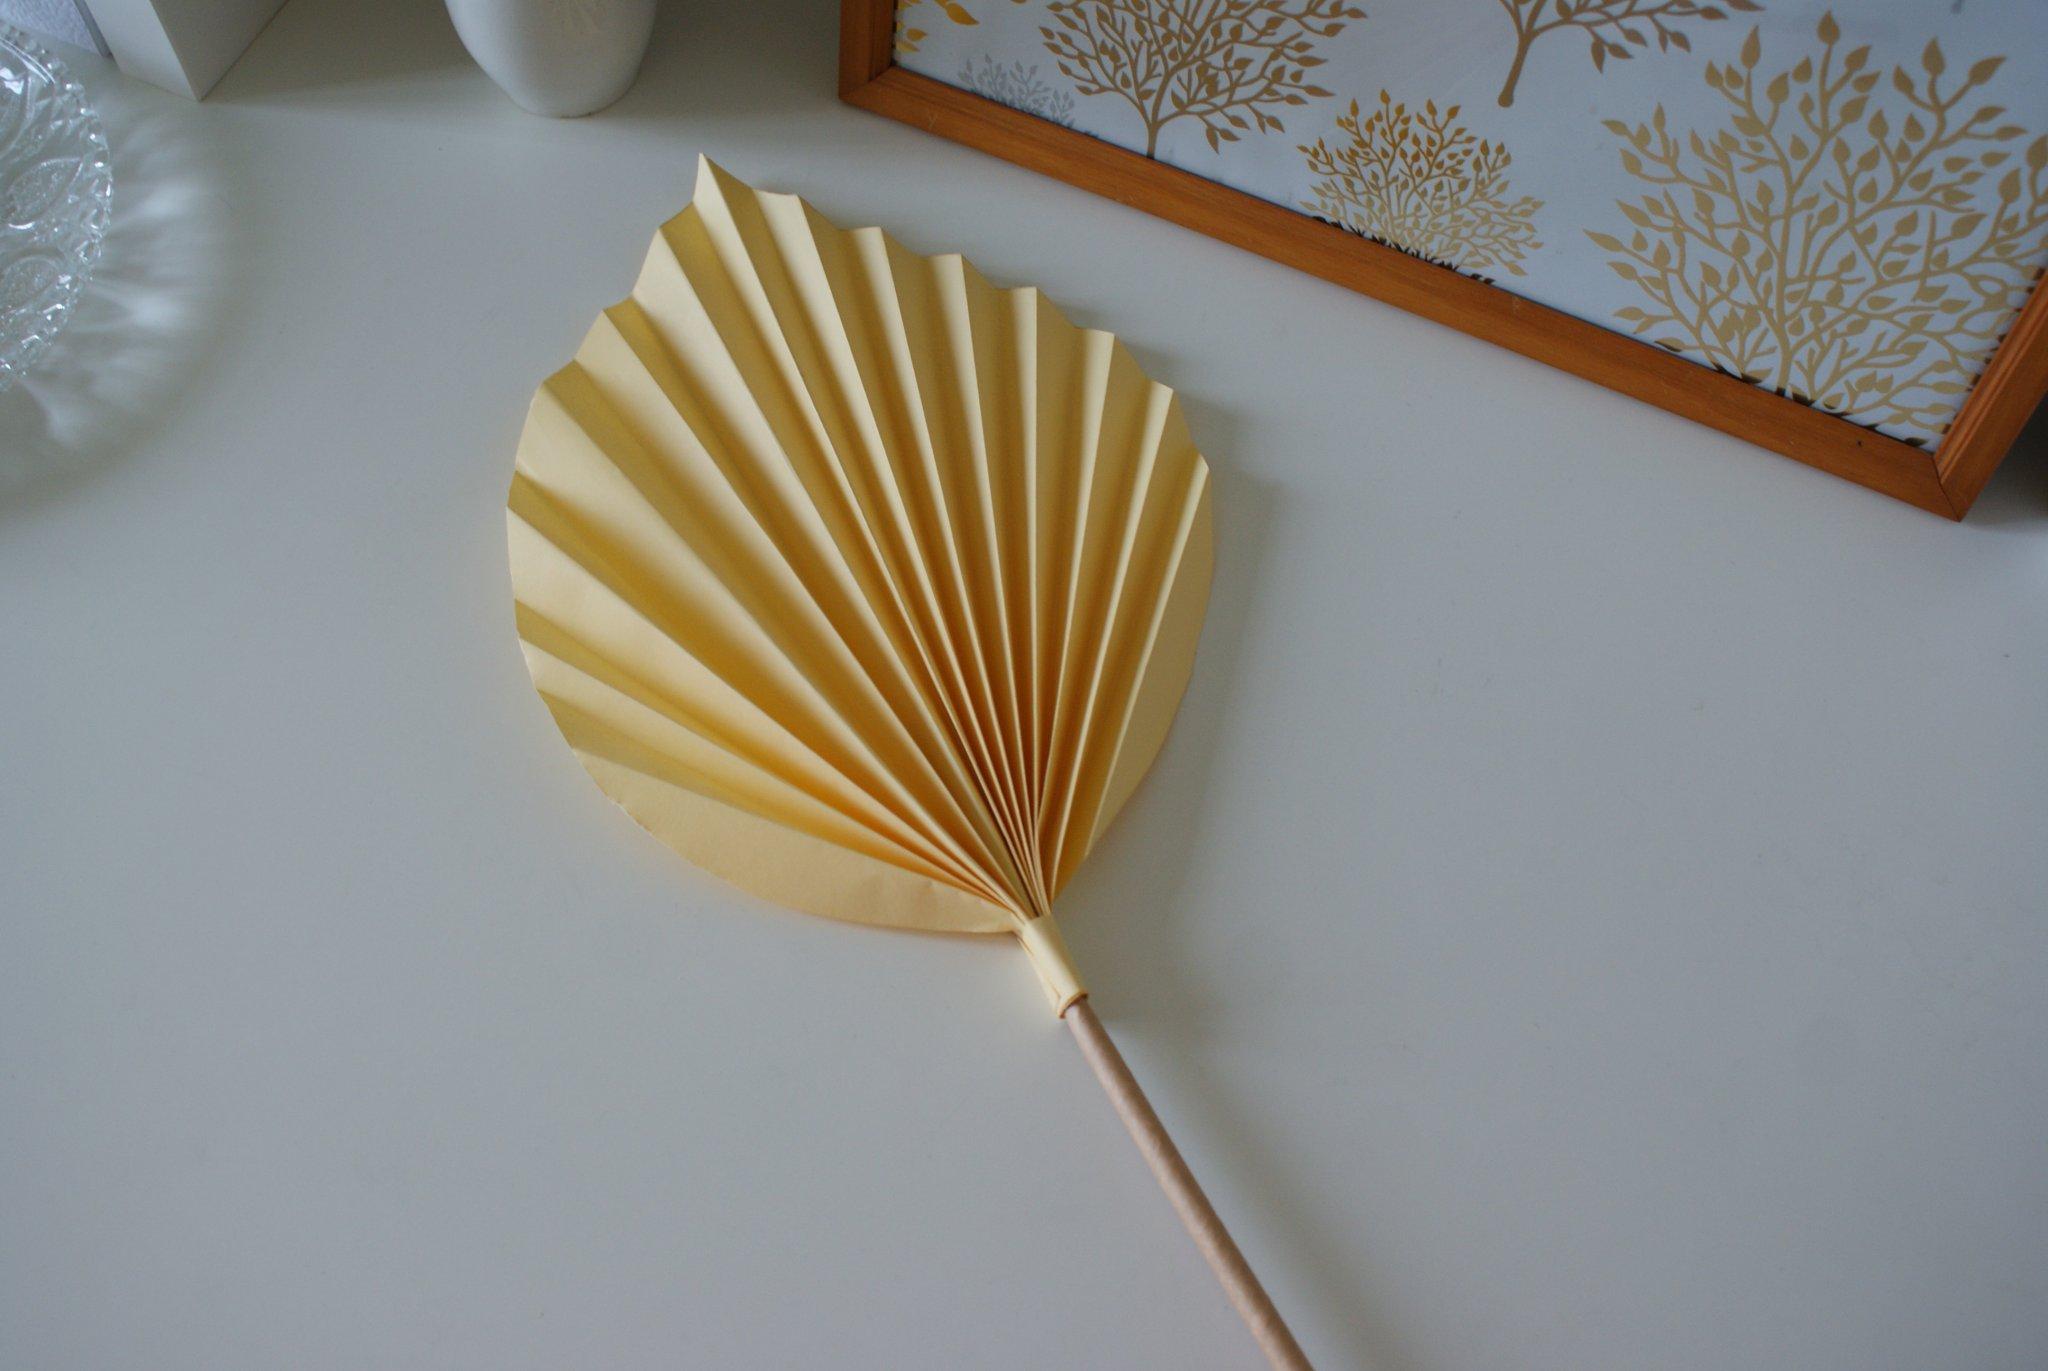 diy palm paper leaf leaves decor idea handmade craft easy simple tutorial home decoration neutral minimalist francinesplaceblog step 11